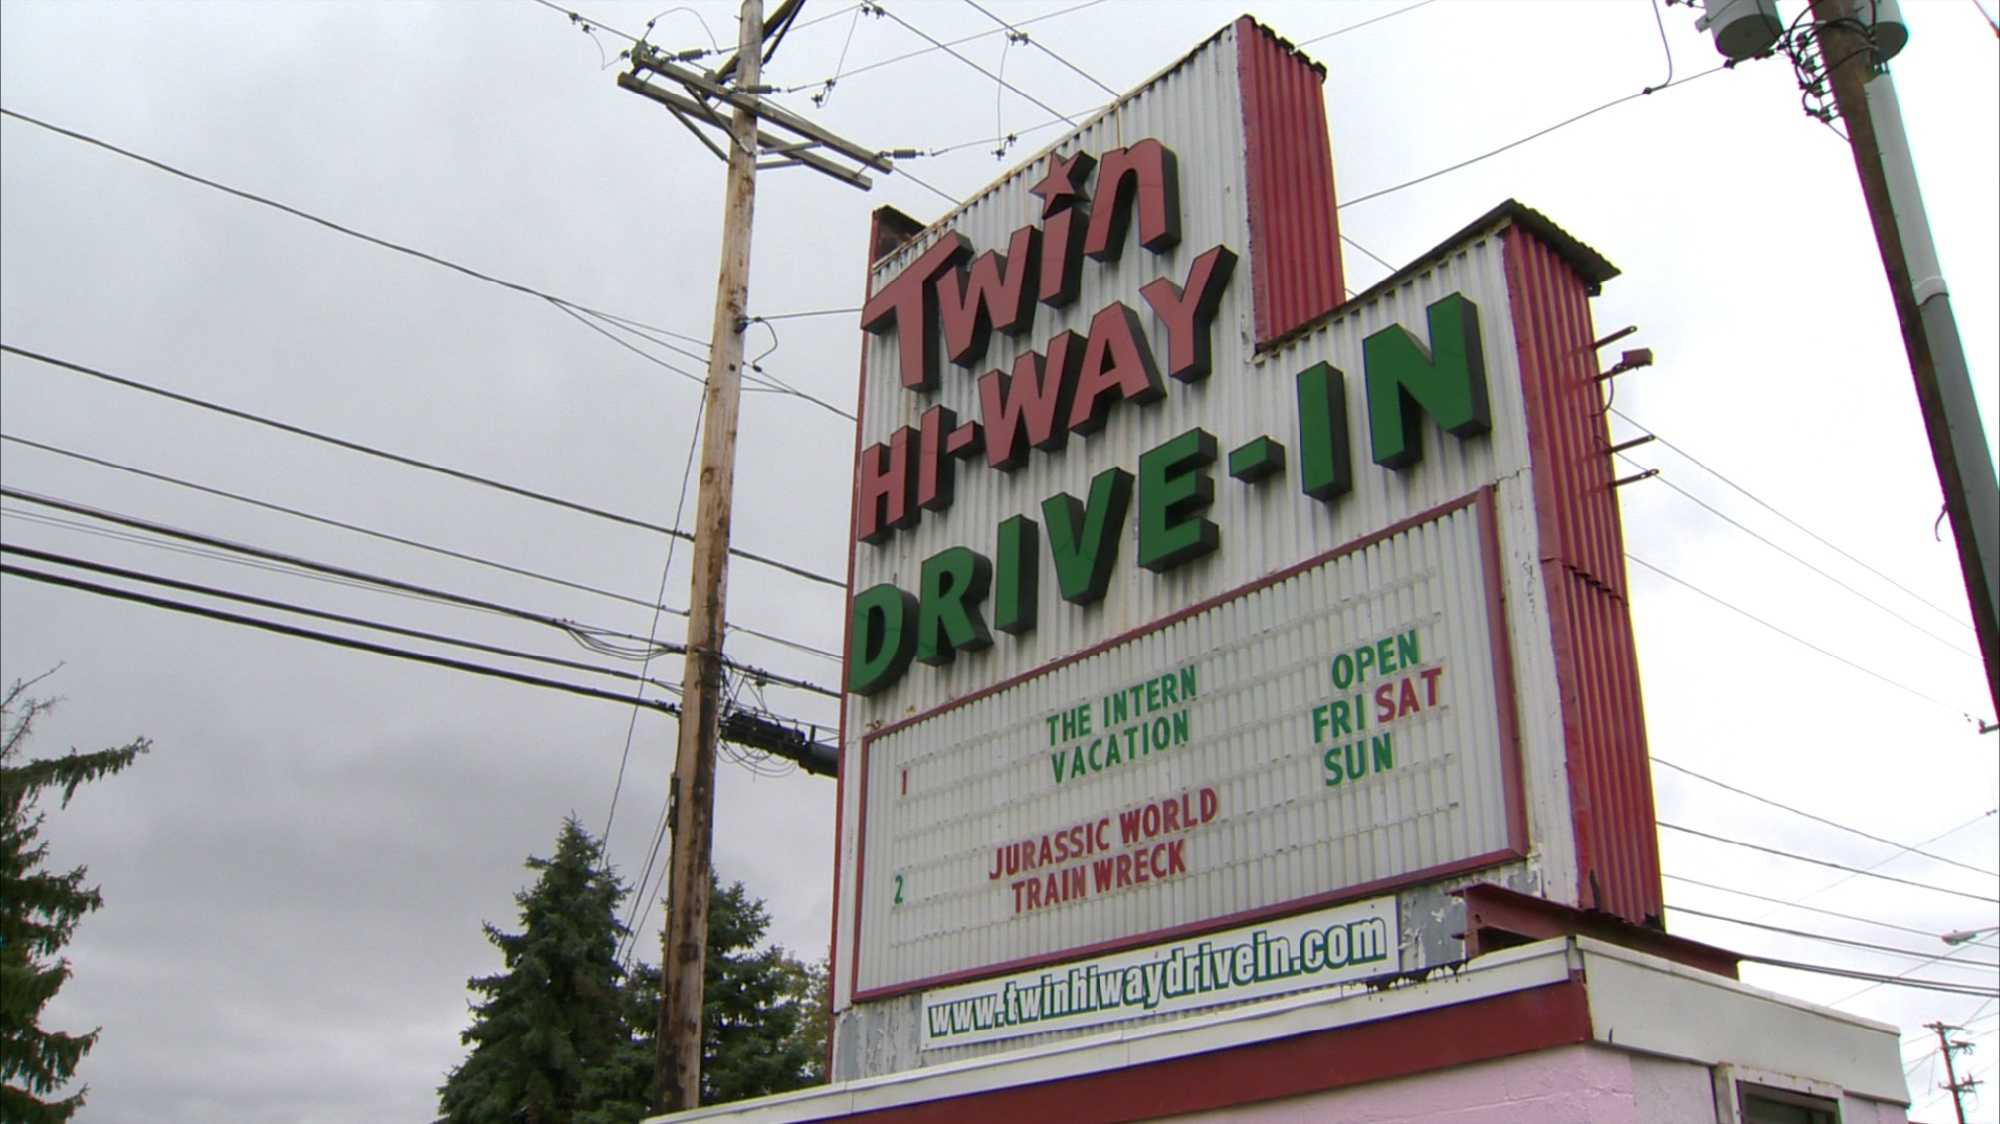 Twin Hi Way Drive In Closing